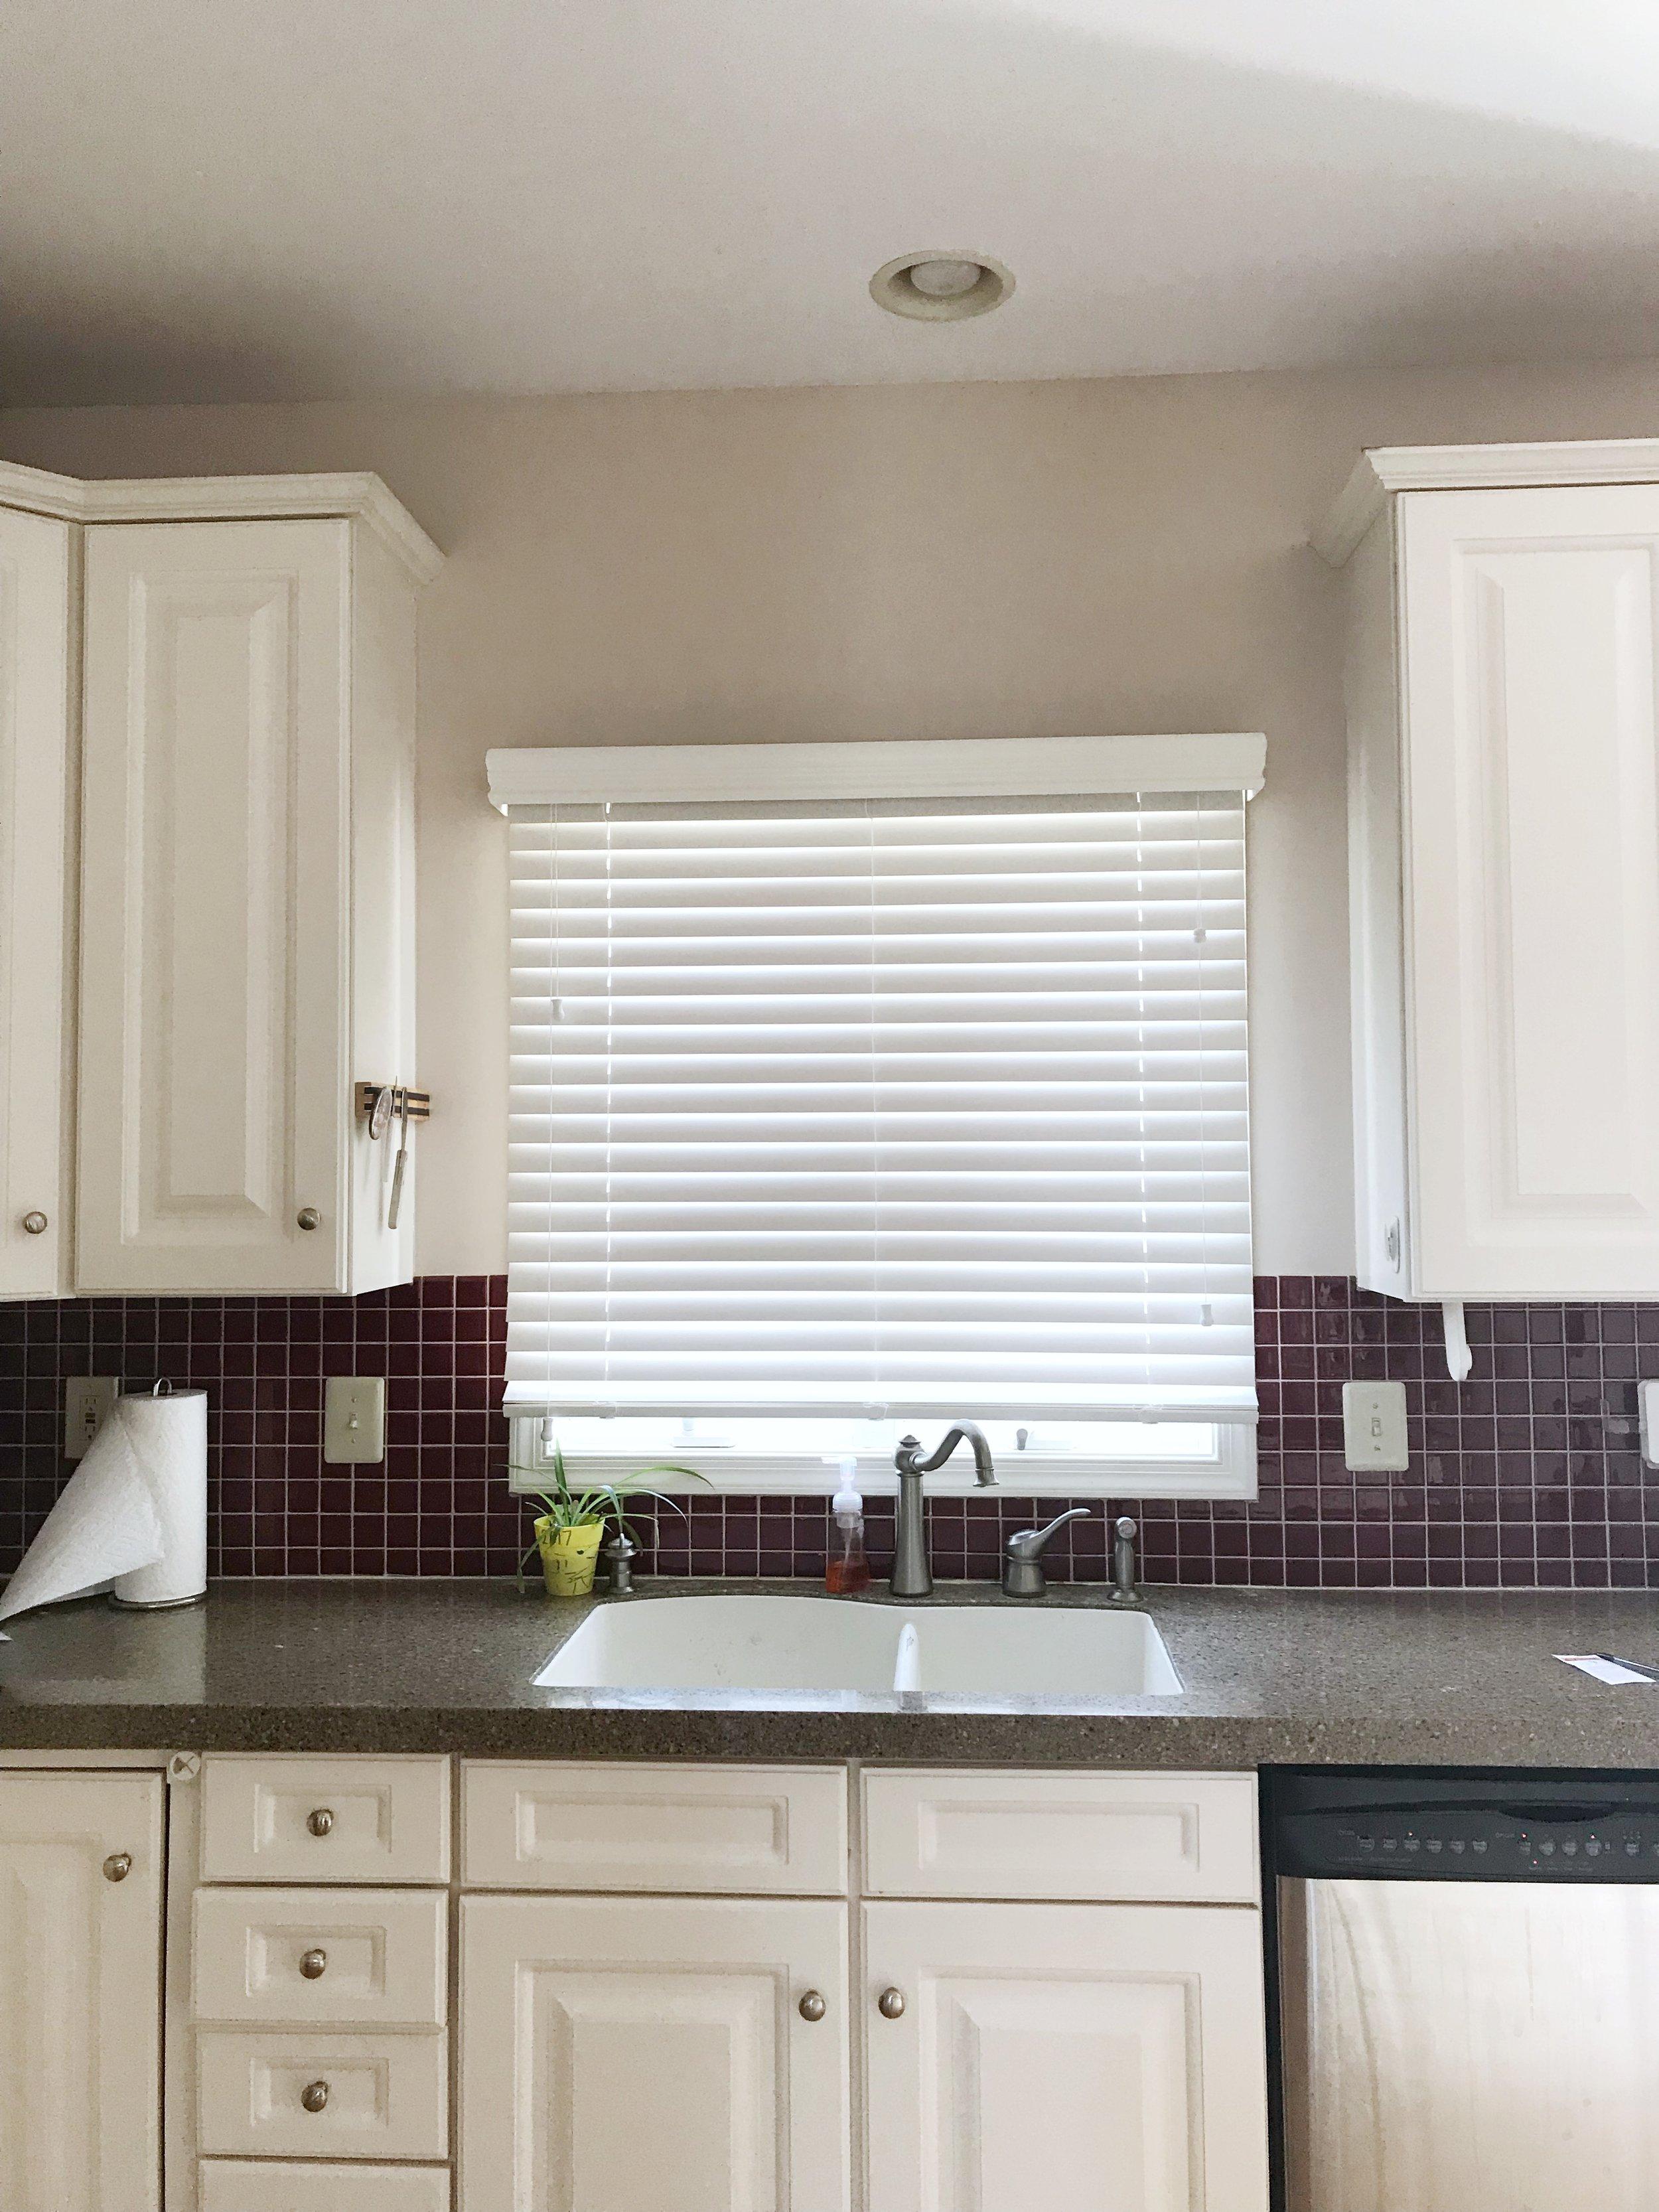 3rdGenBlinds white custom white window blinds over sink in kitchen